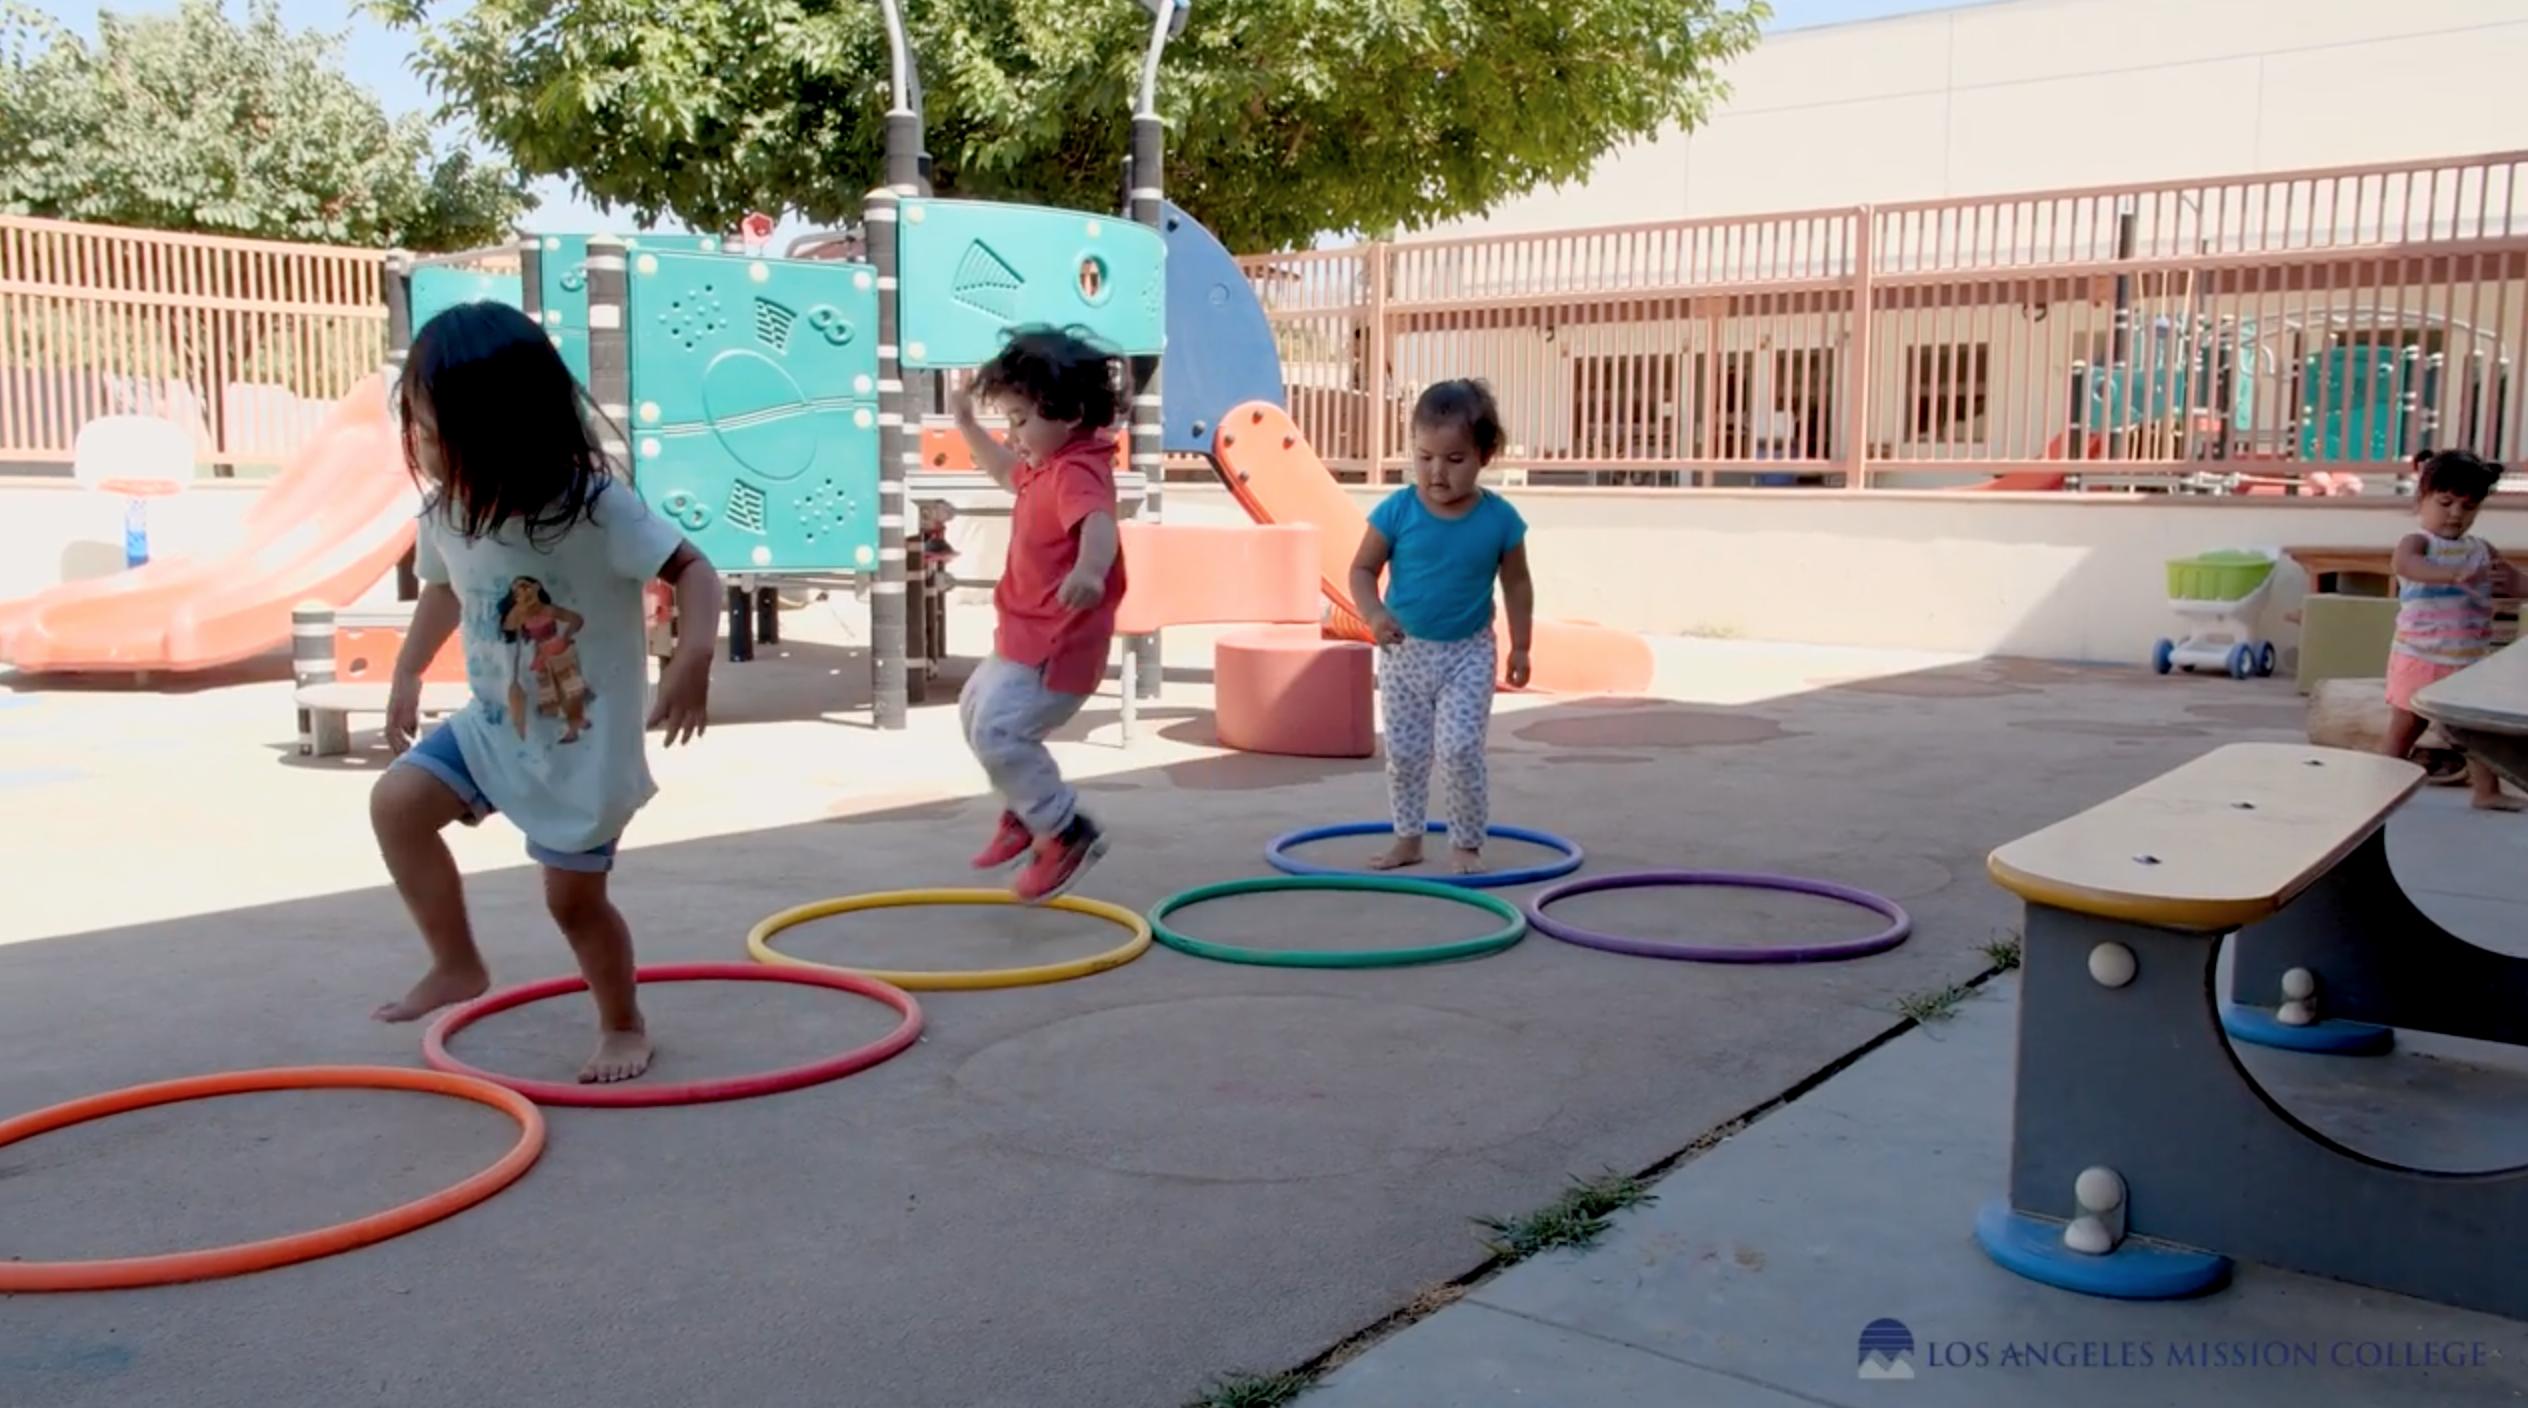 Children playing at the Child Development Center